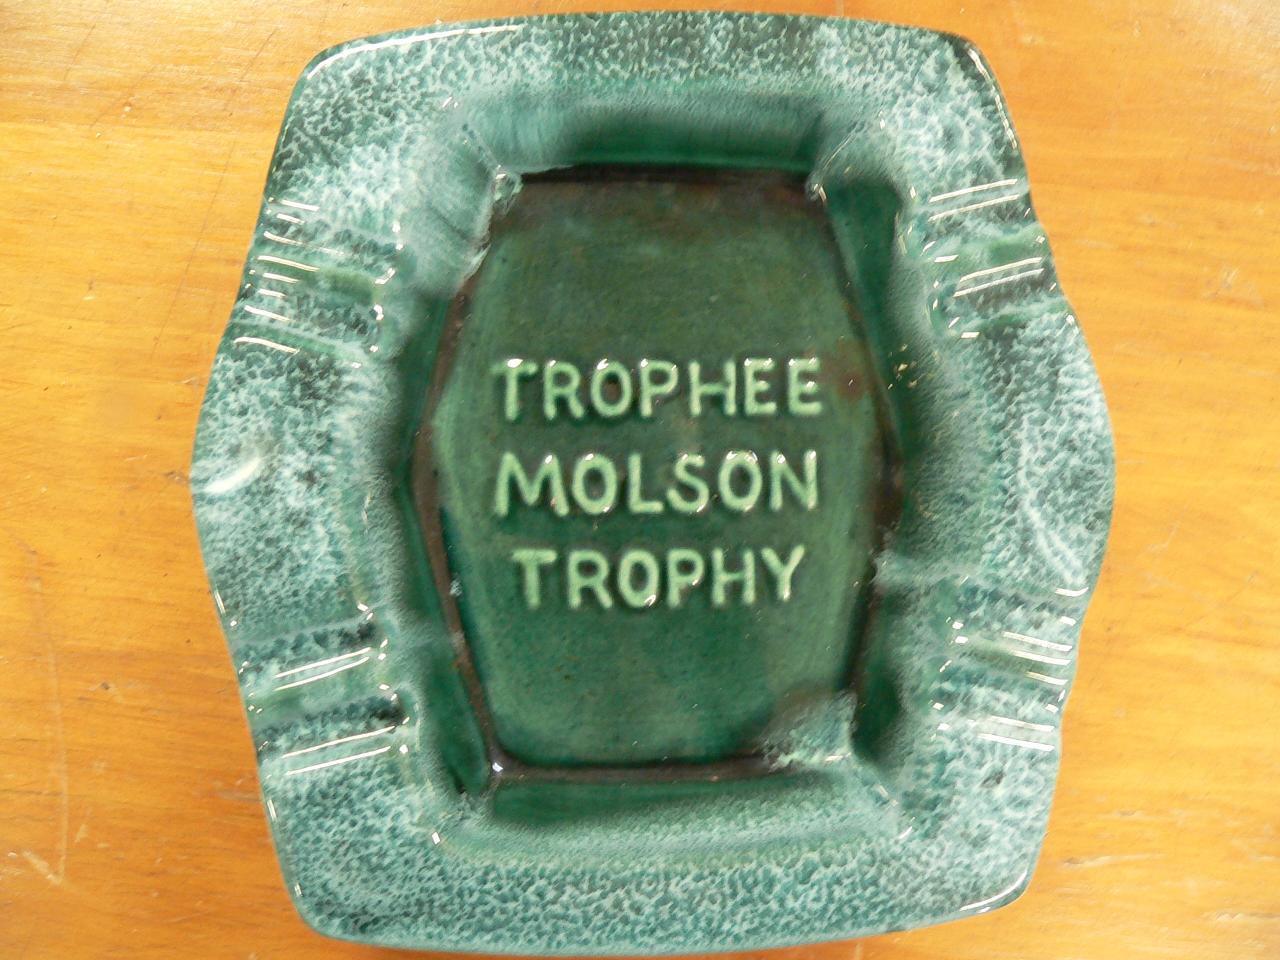 Cendrier molson trophee # 4198